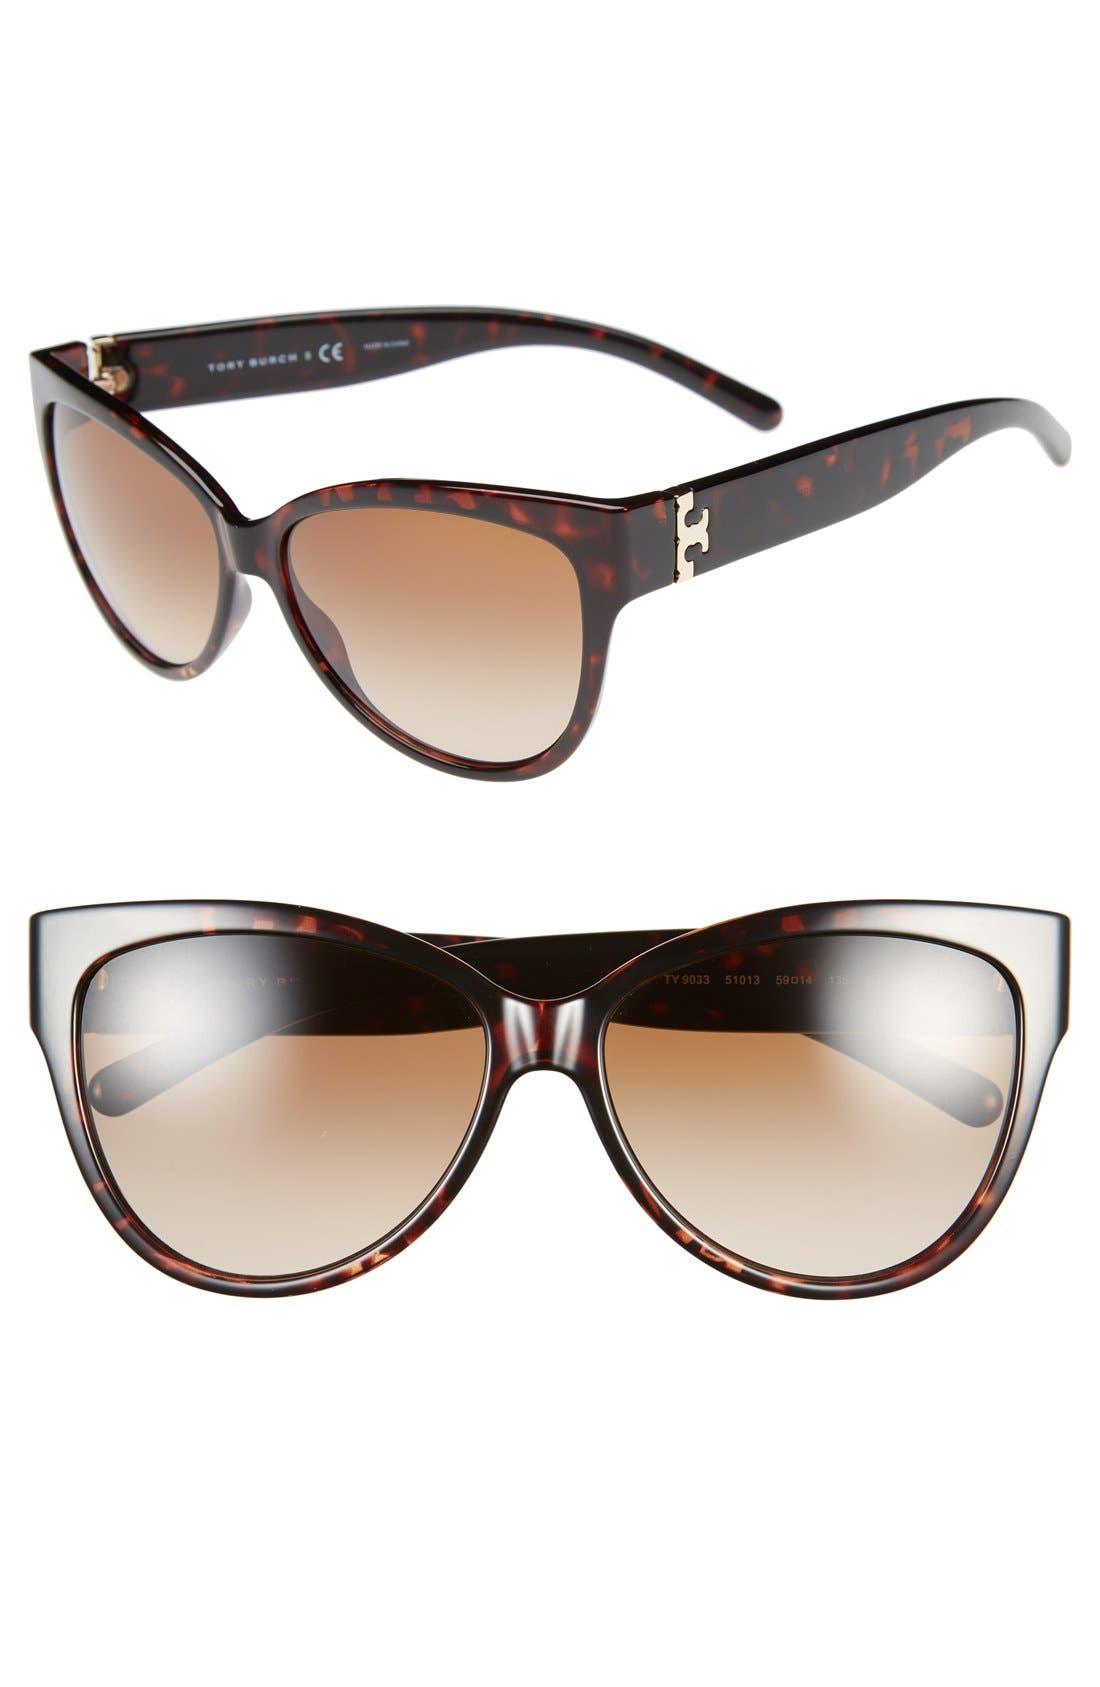 Main Image - Tory Burch 59mm Cat Eye Sunglasses